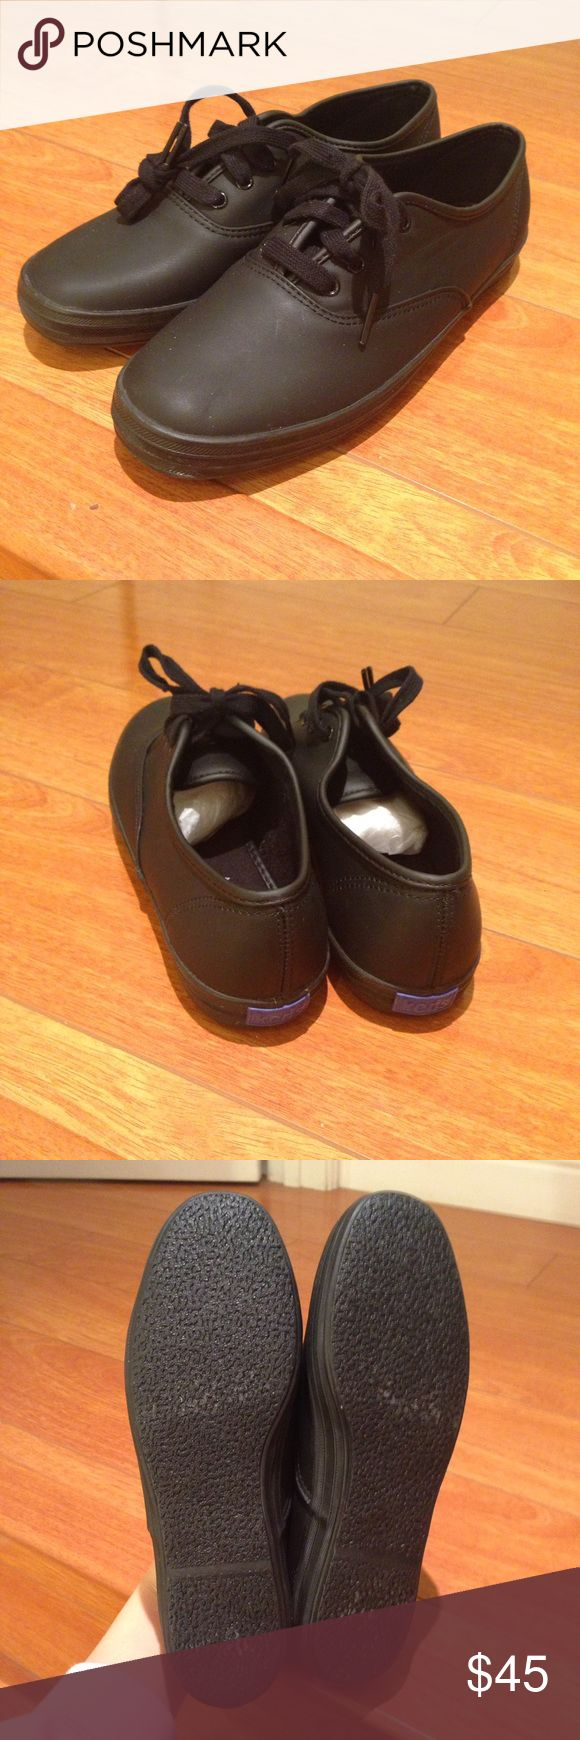 NWOT Keds Black Leather Sneakers NWOT Keds Black Leather Sneakers Keds Shoes Sneakers